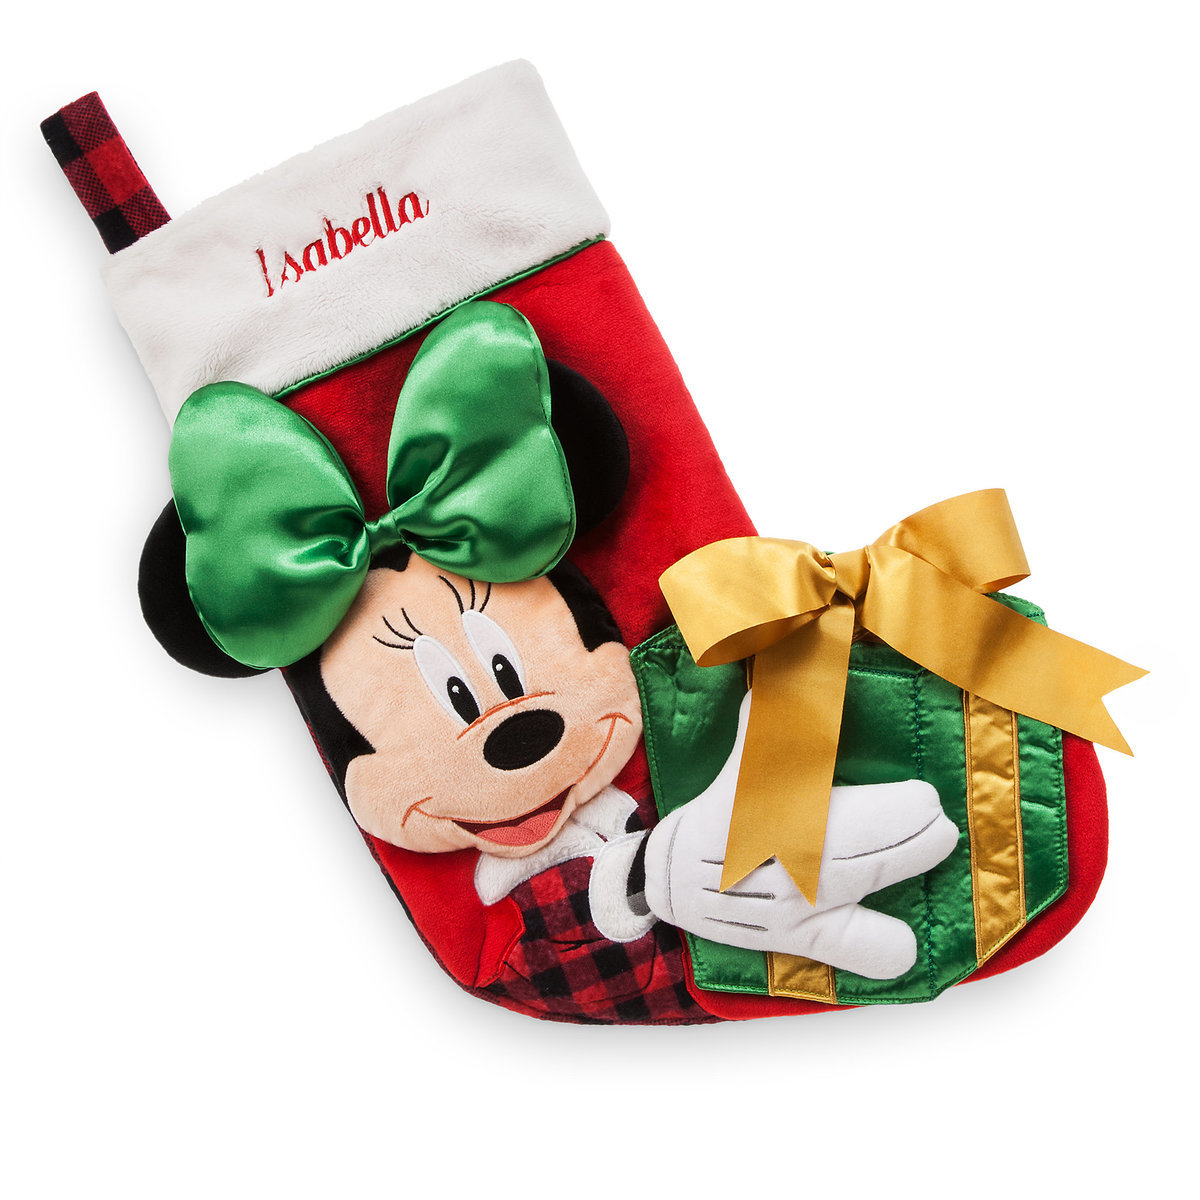 Christmas Minnie Mouse Plush.Disney Christmas Holiday Stocking Minnie Mouse Plush Holiday 2017